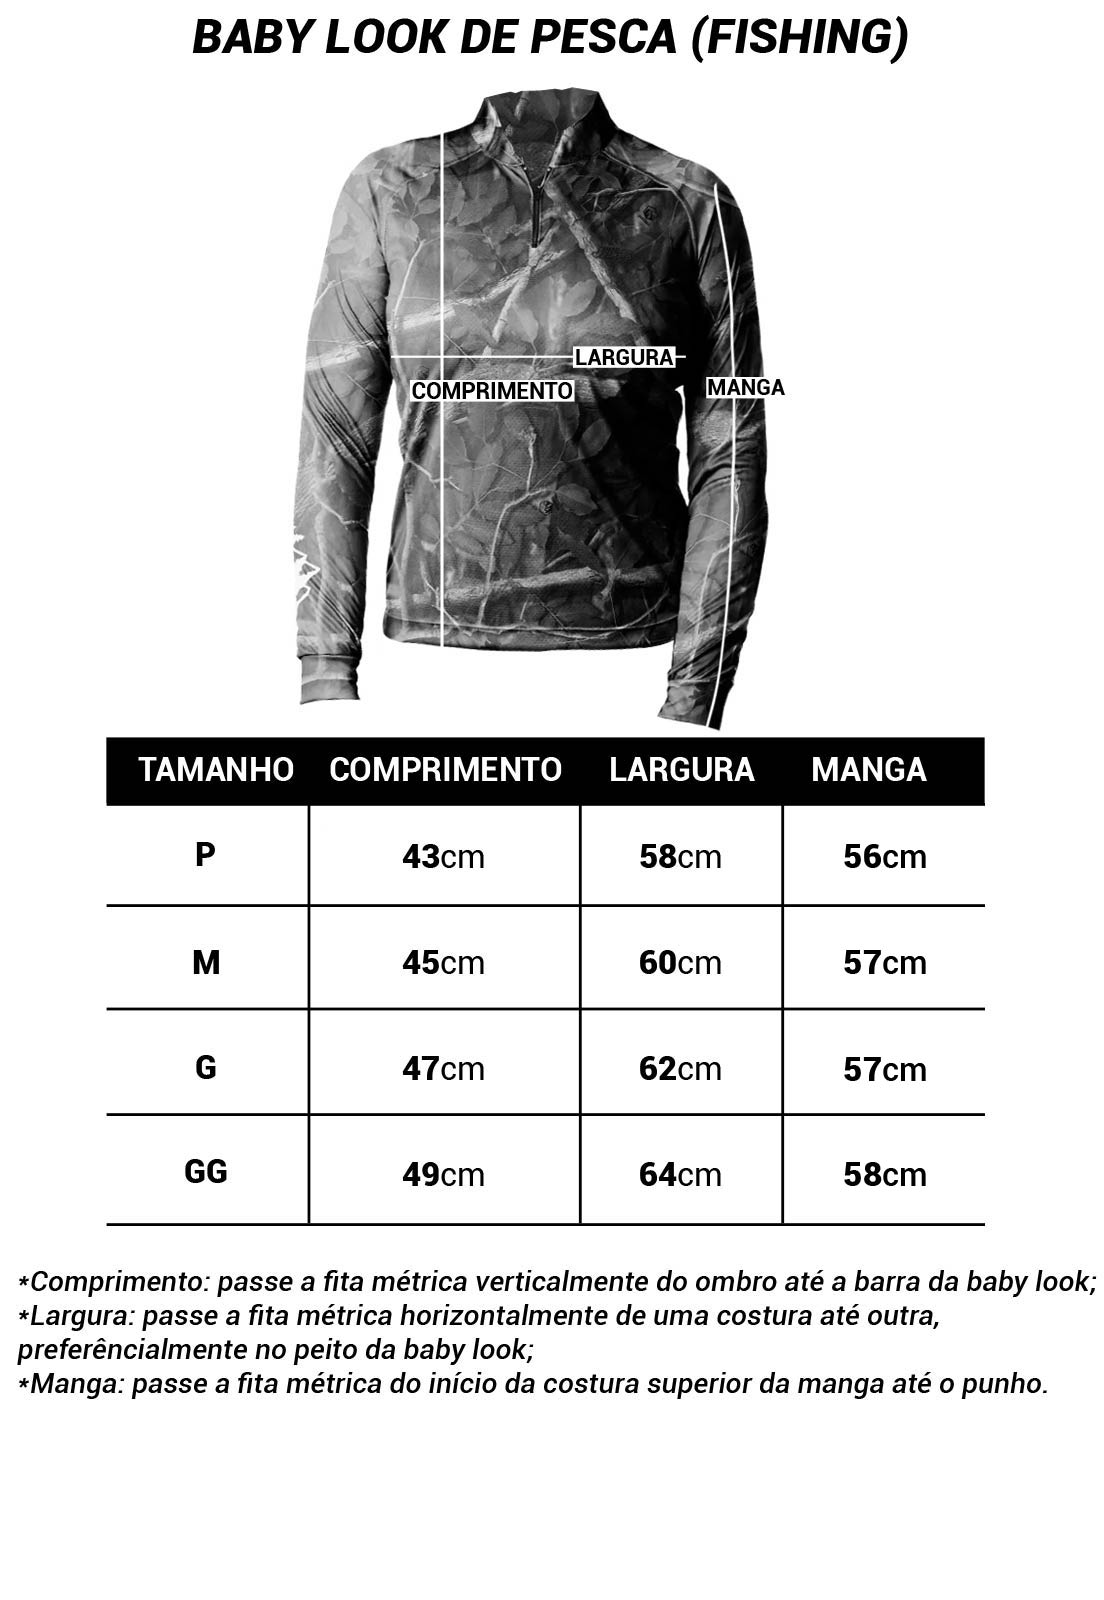 CAMISA DE PESCA FISH CAMUFLADA PRO 18 FEMININA + BANDANA GRÁTIS  - REAL HUNTER OUTDOORS